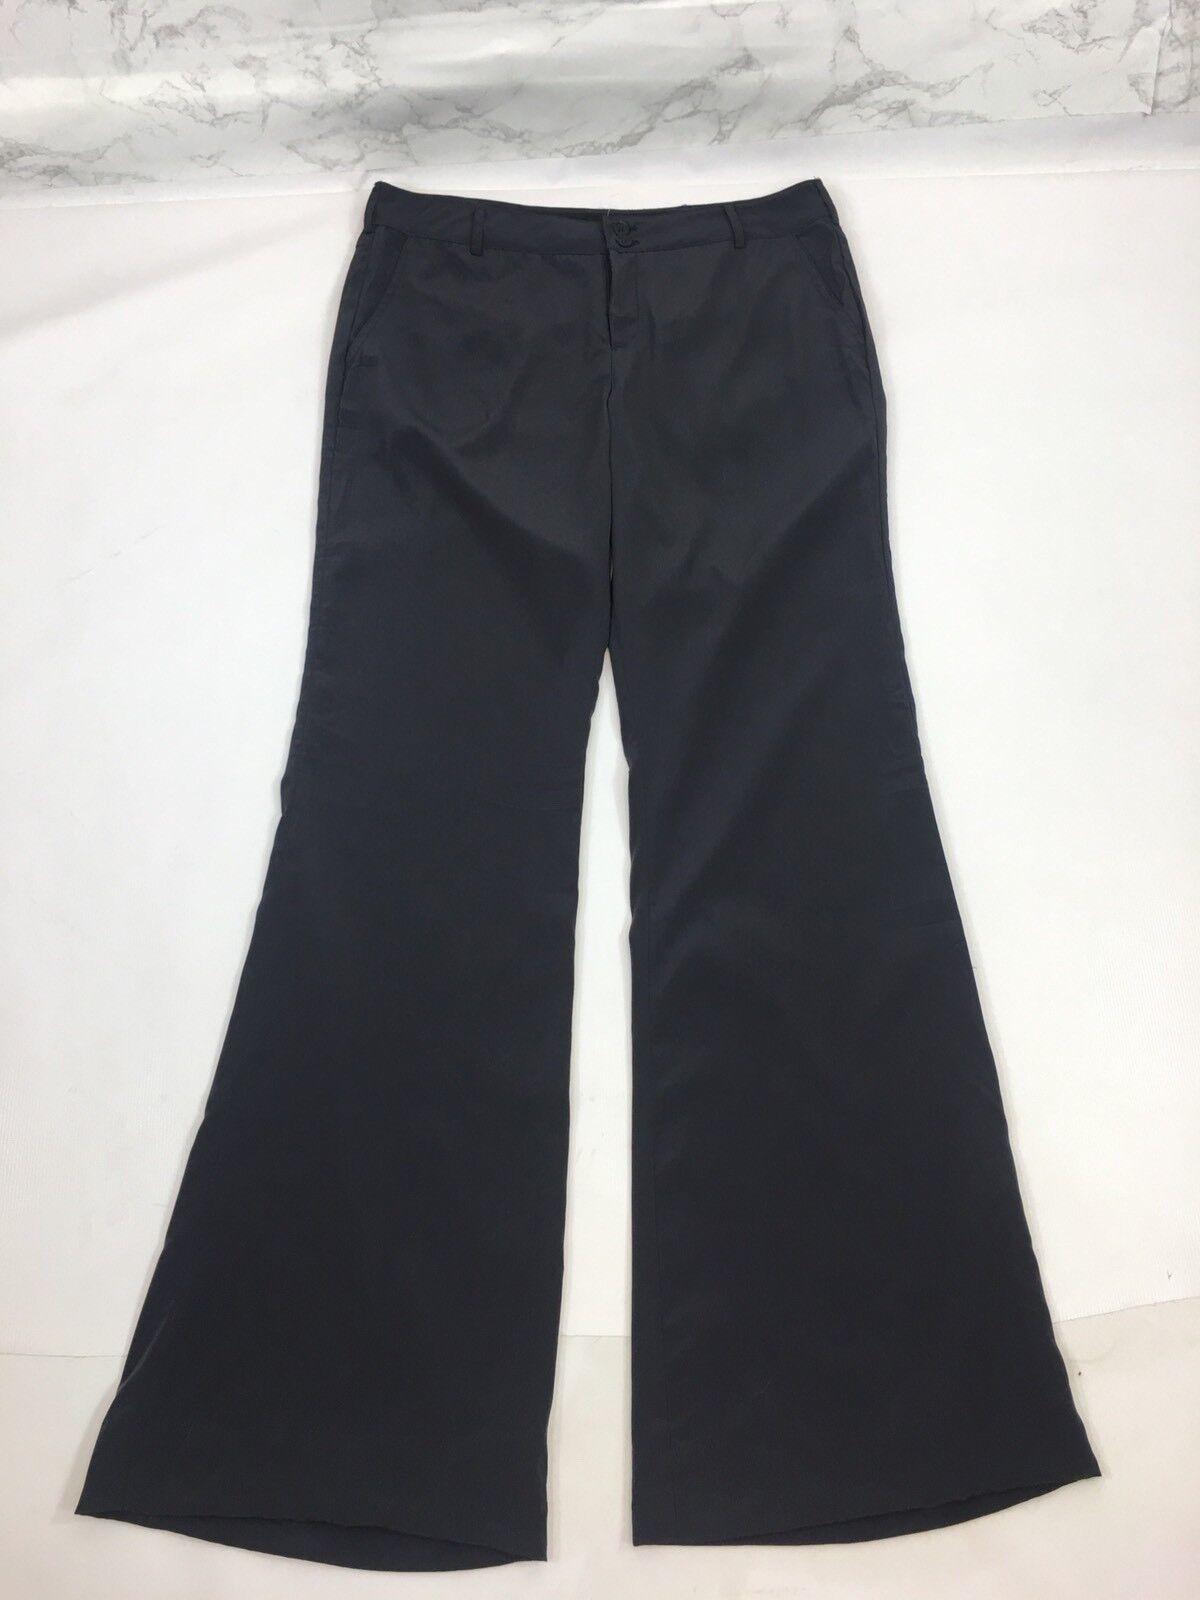 Joes Jeans Women's  the Pant  Polyester Pants Sz 29